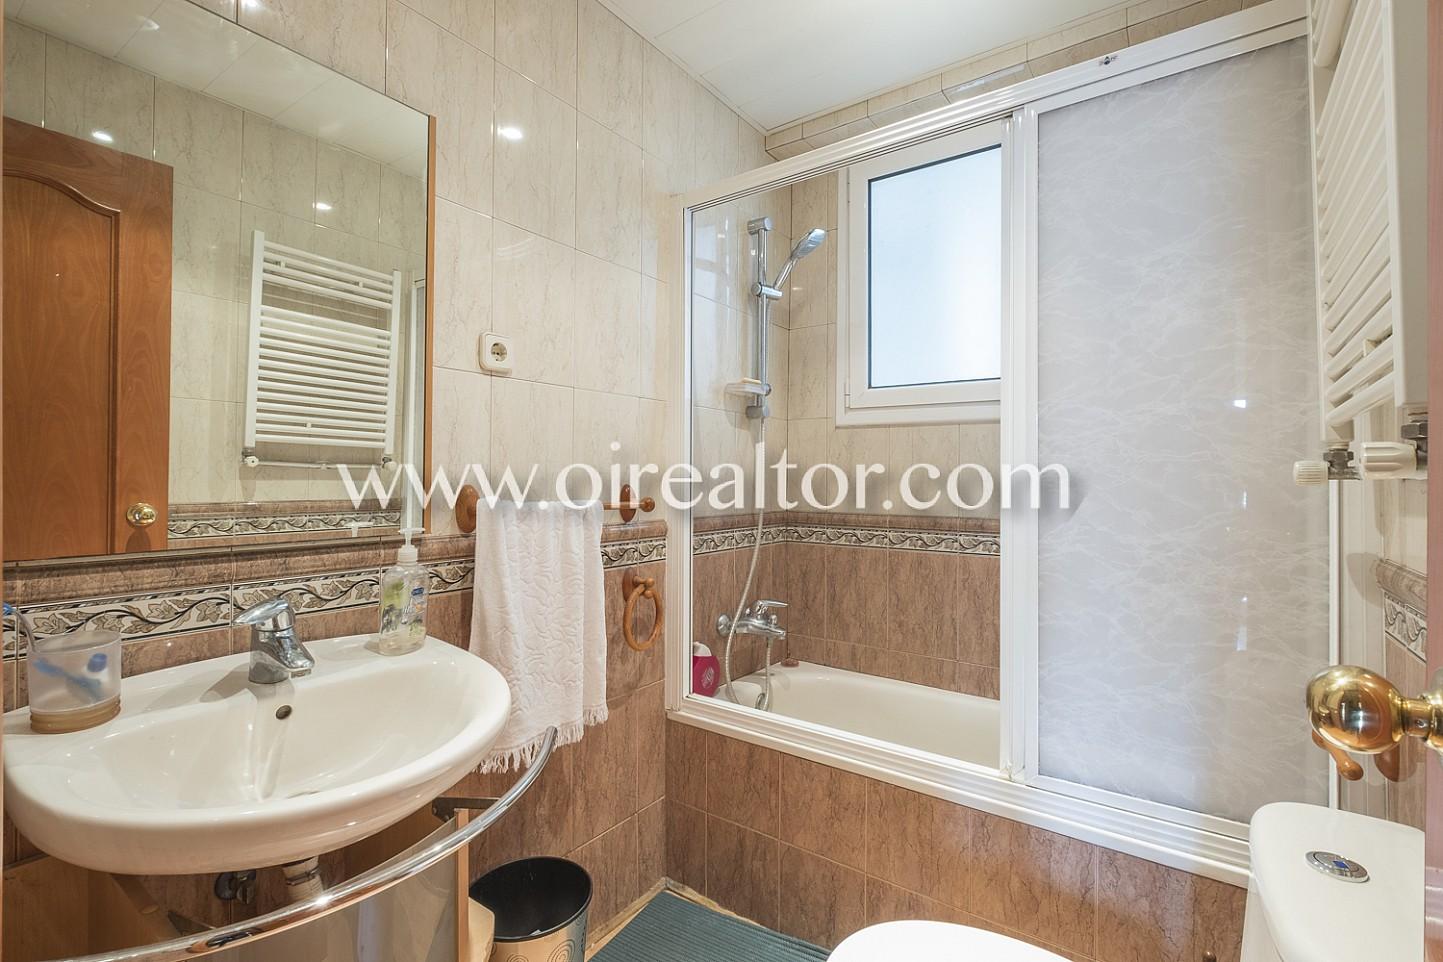 Baño, bañera, baño completo, luminoso, iluminado, soleado, baño equipado